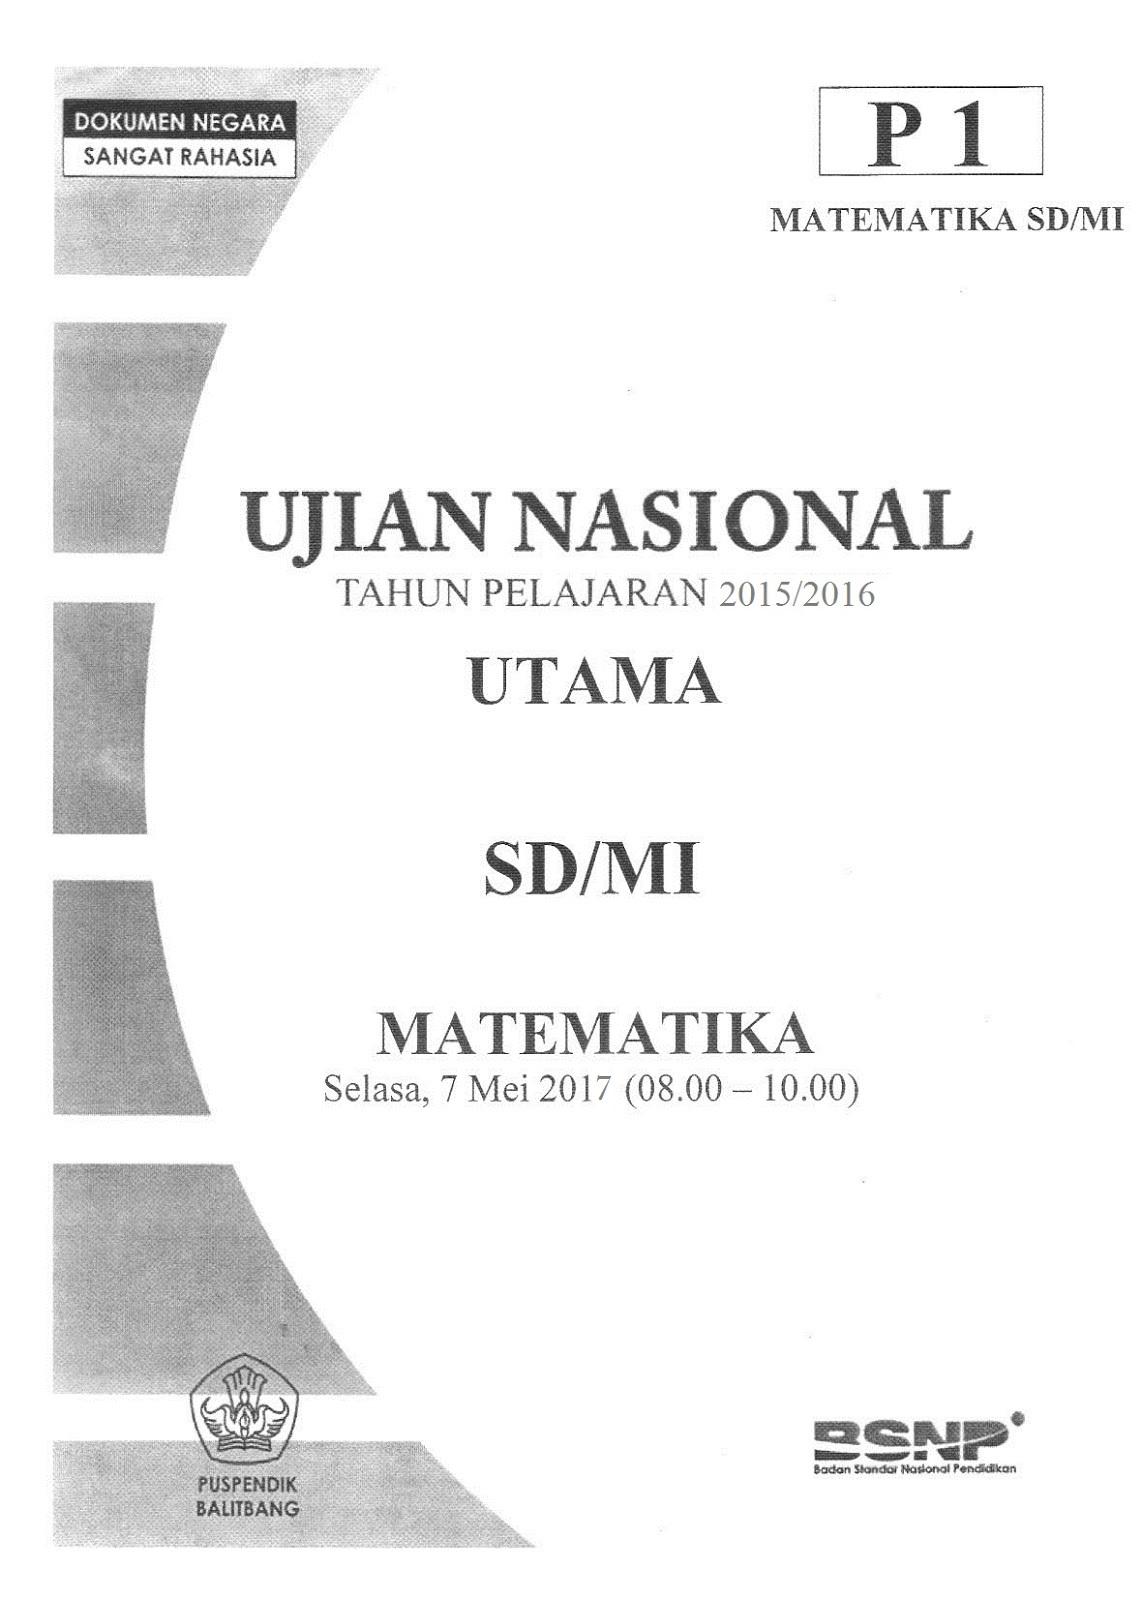 Latihan Soal Us Sd 2017 Bahasa Indonesia Matematika Dan Ipa Info Kepegawaian